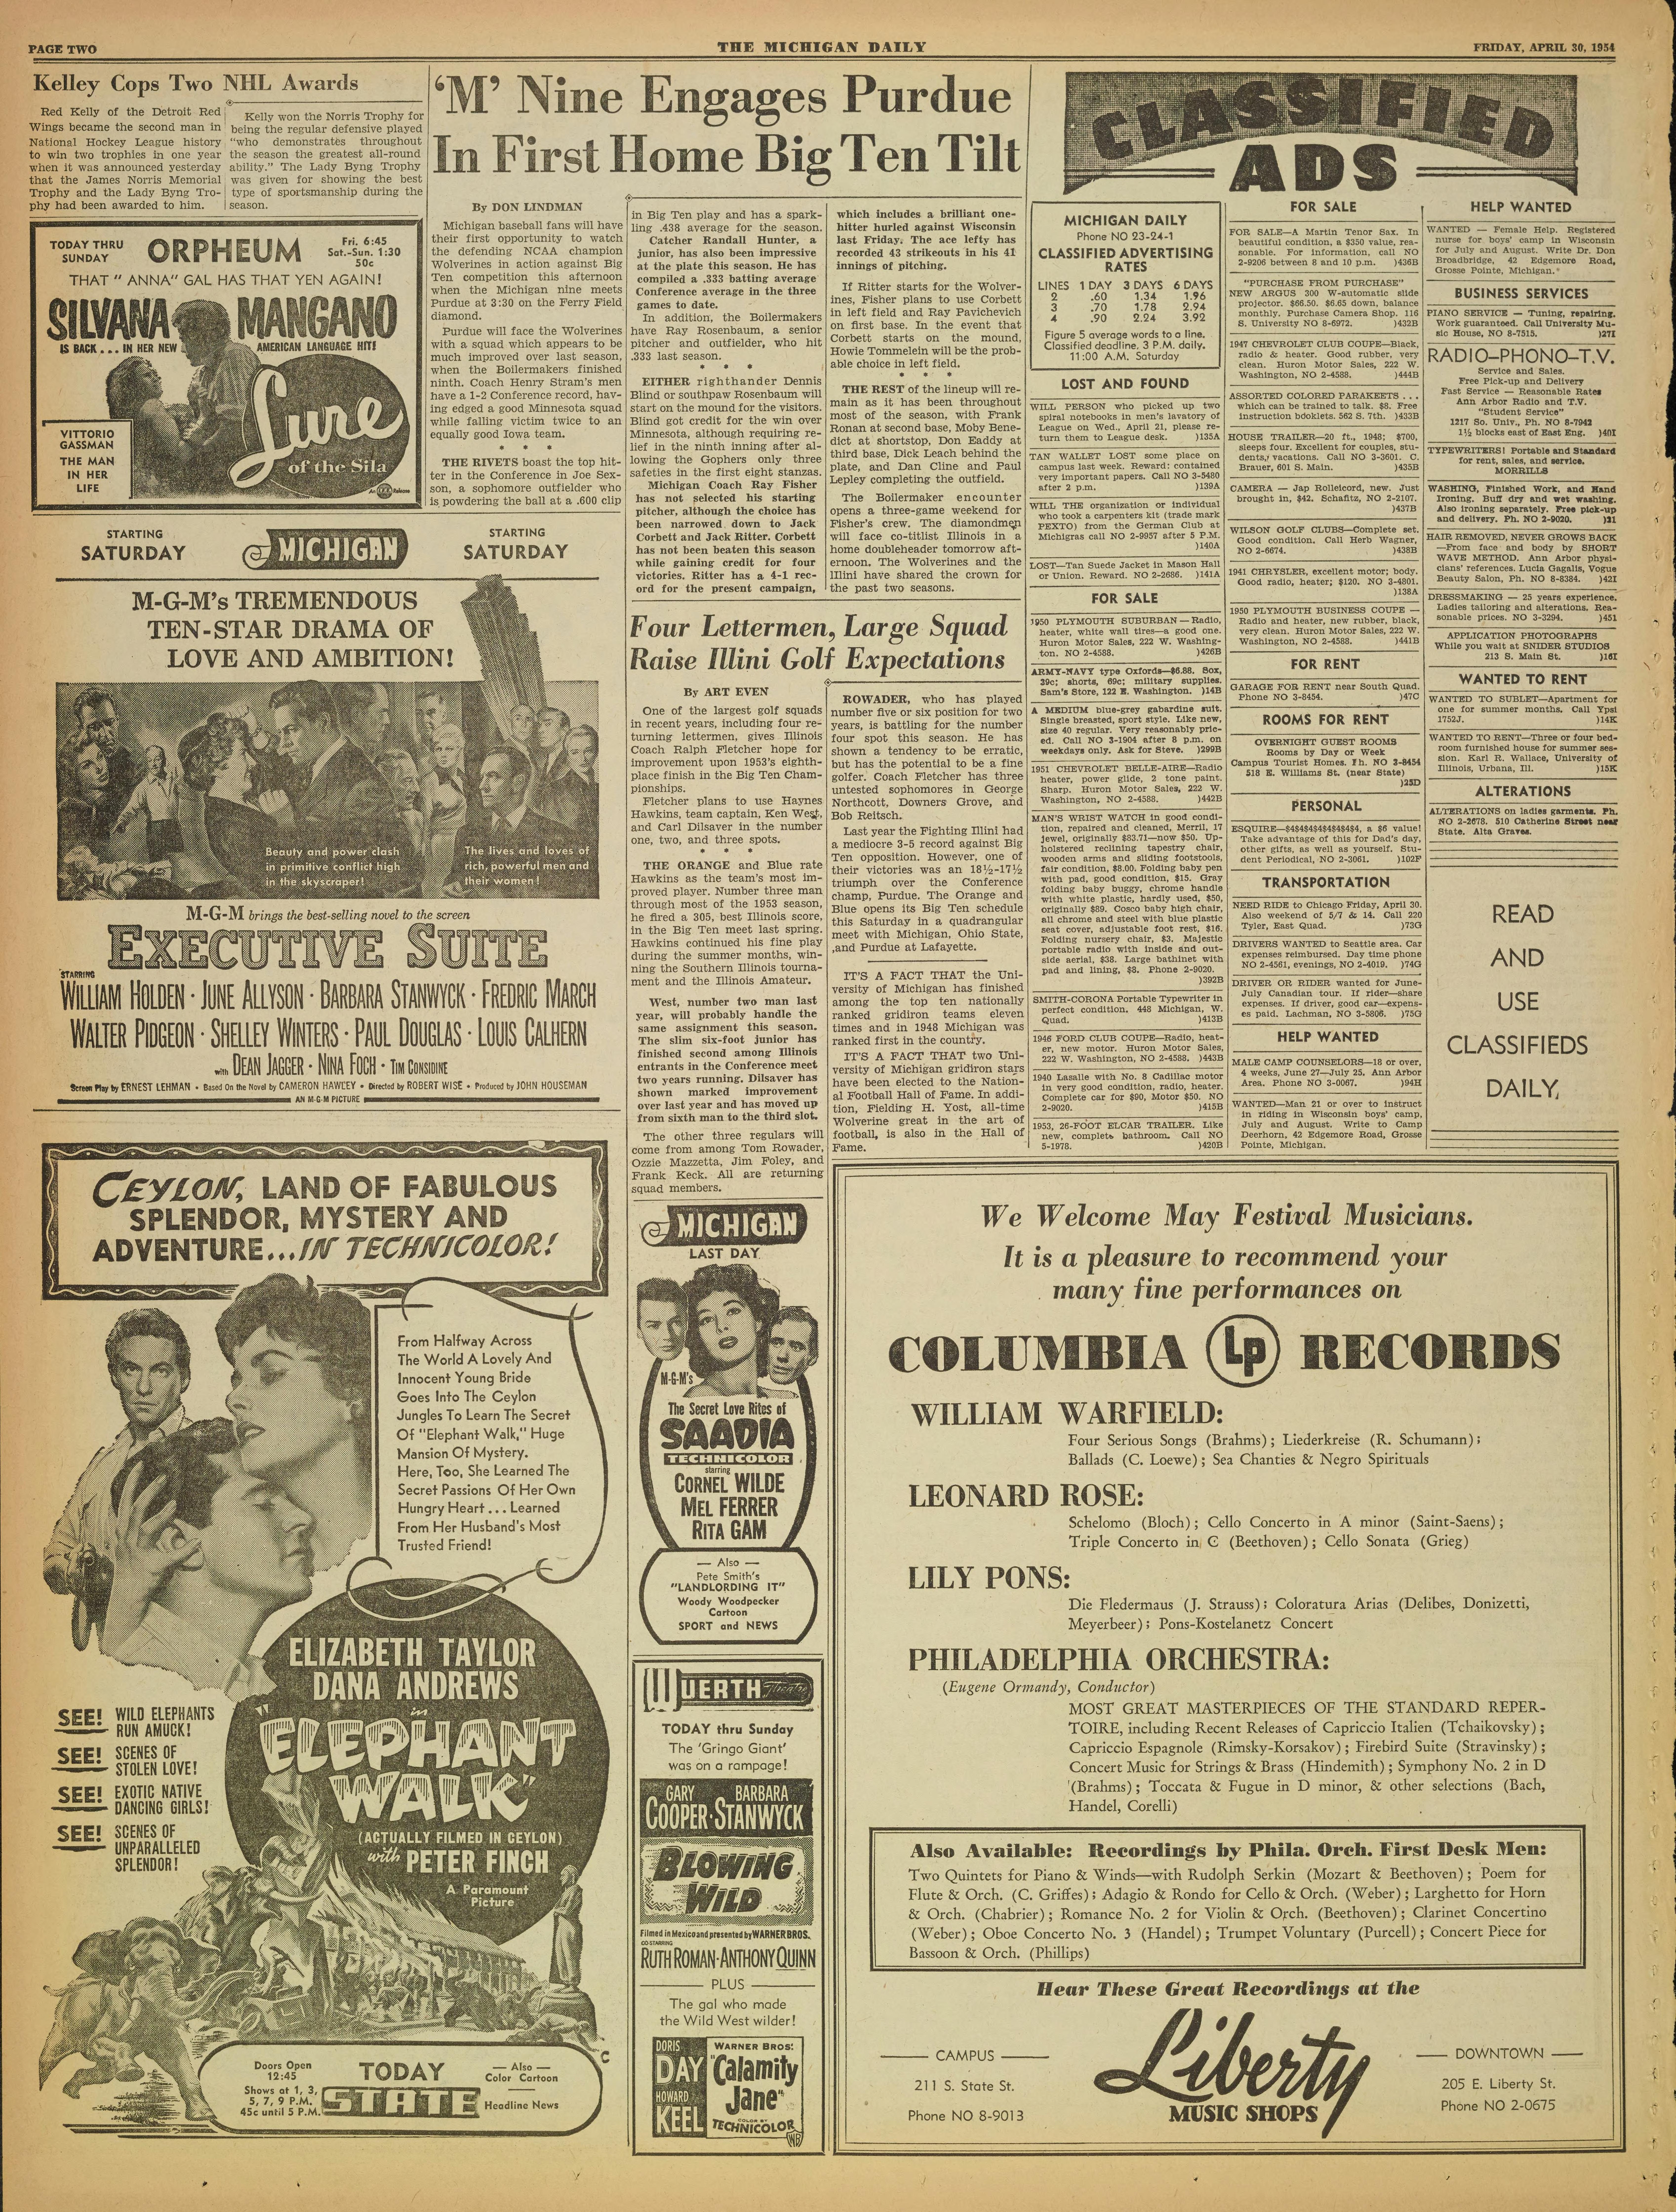 Michigan Daily Digital Archives - April 30, 1954 (vol  64, iss  145